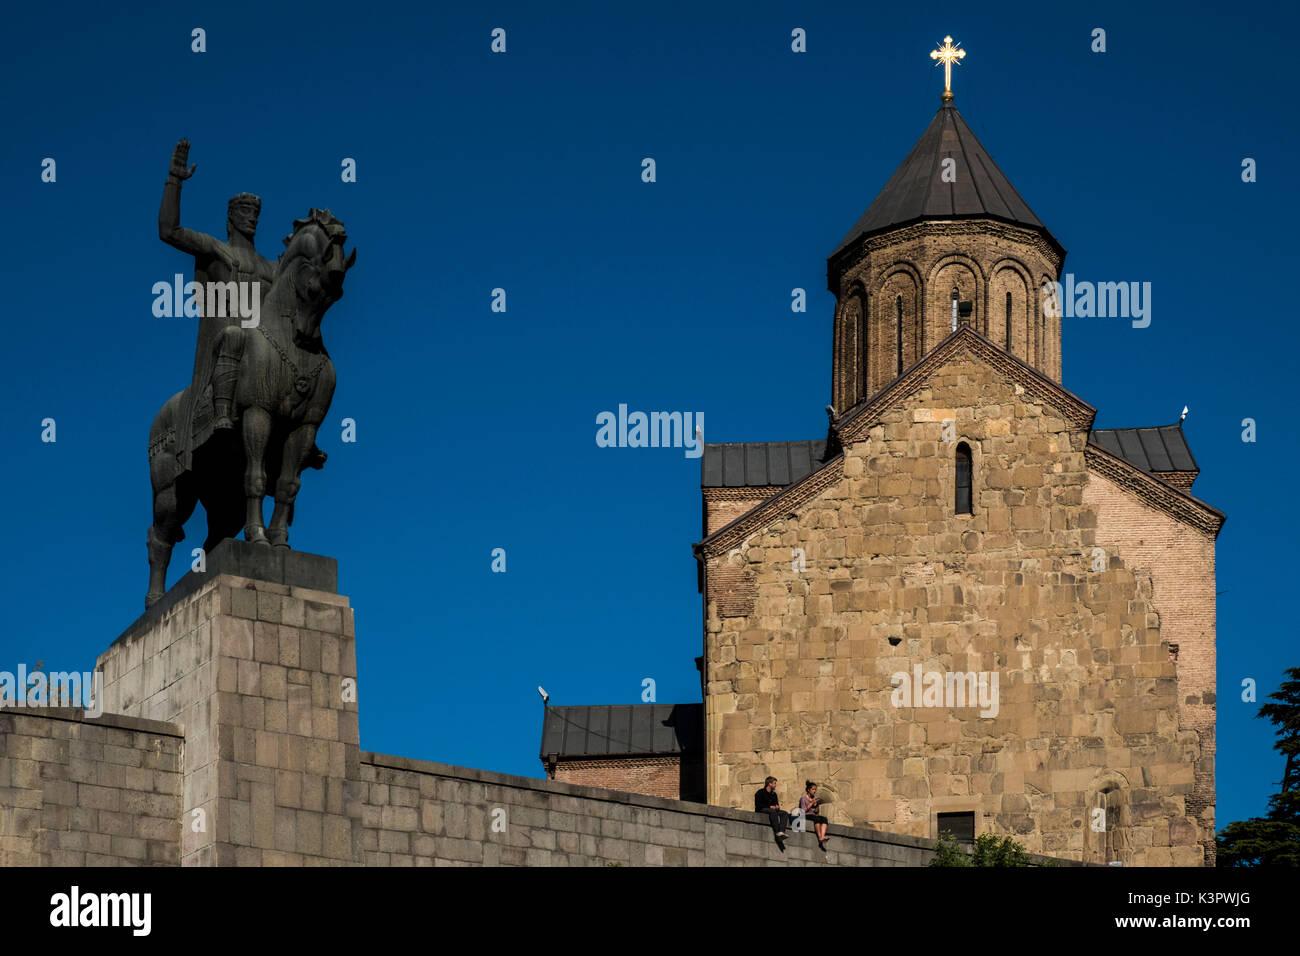 The equestrian statue of King Vakhtang Gorgasali near the Methehi church, Tbilisi, Georgia, Caucaus, Eurasia. Stock Photo